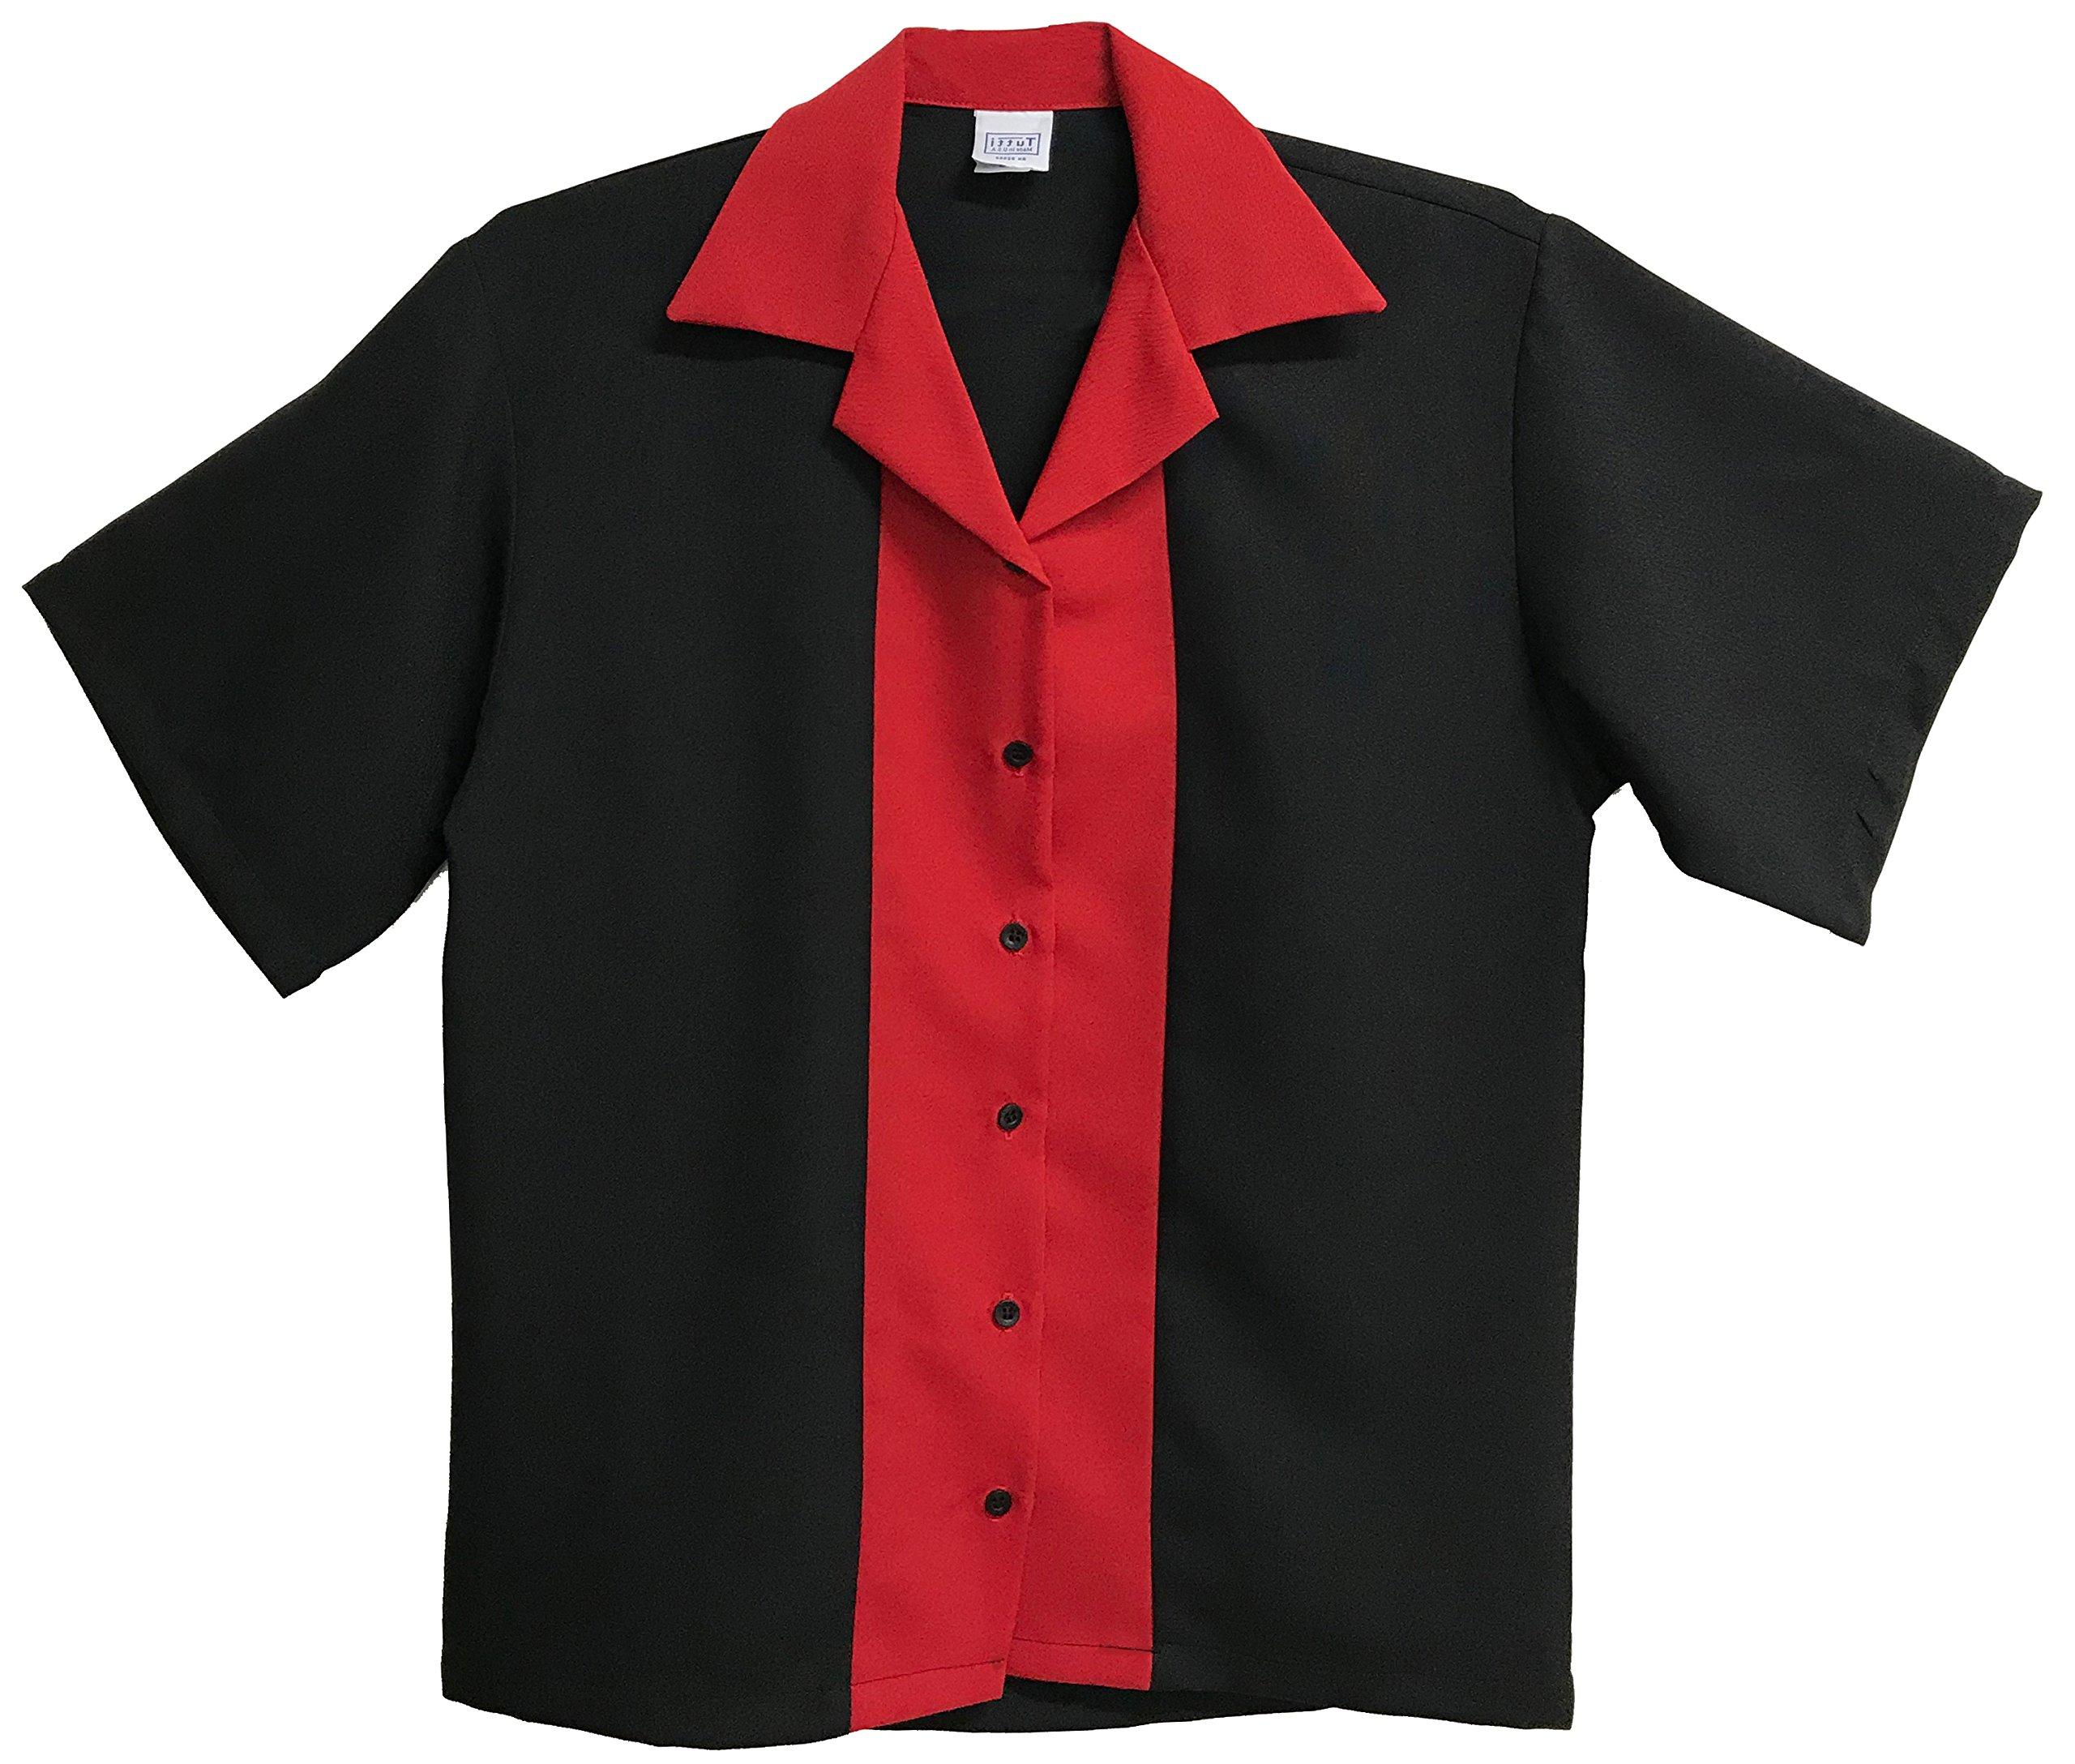 Tutti Ladies Retro Bowling Shirt 50's Style ~ Classic 57 Womens Bowling Shirts (Small) Red